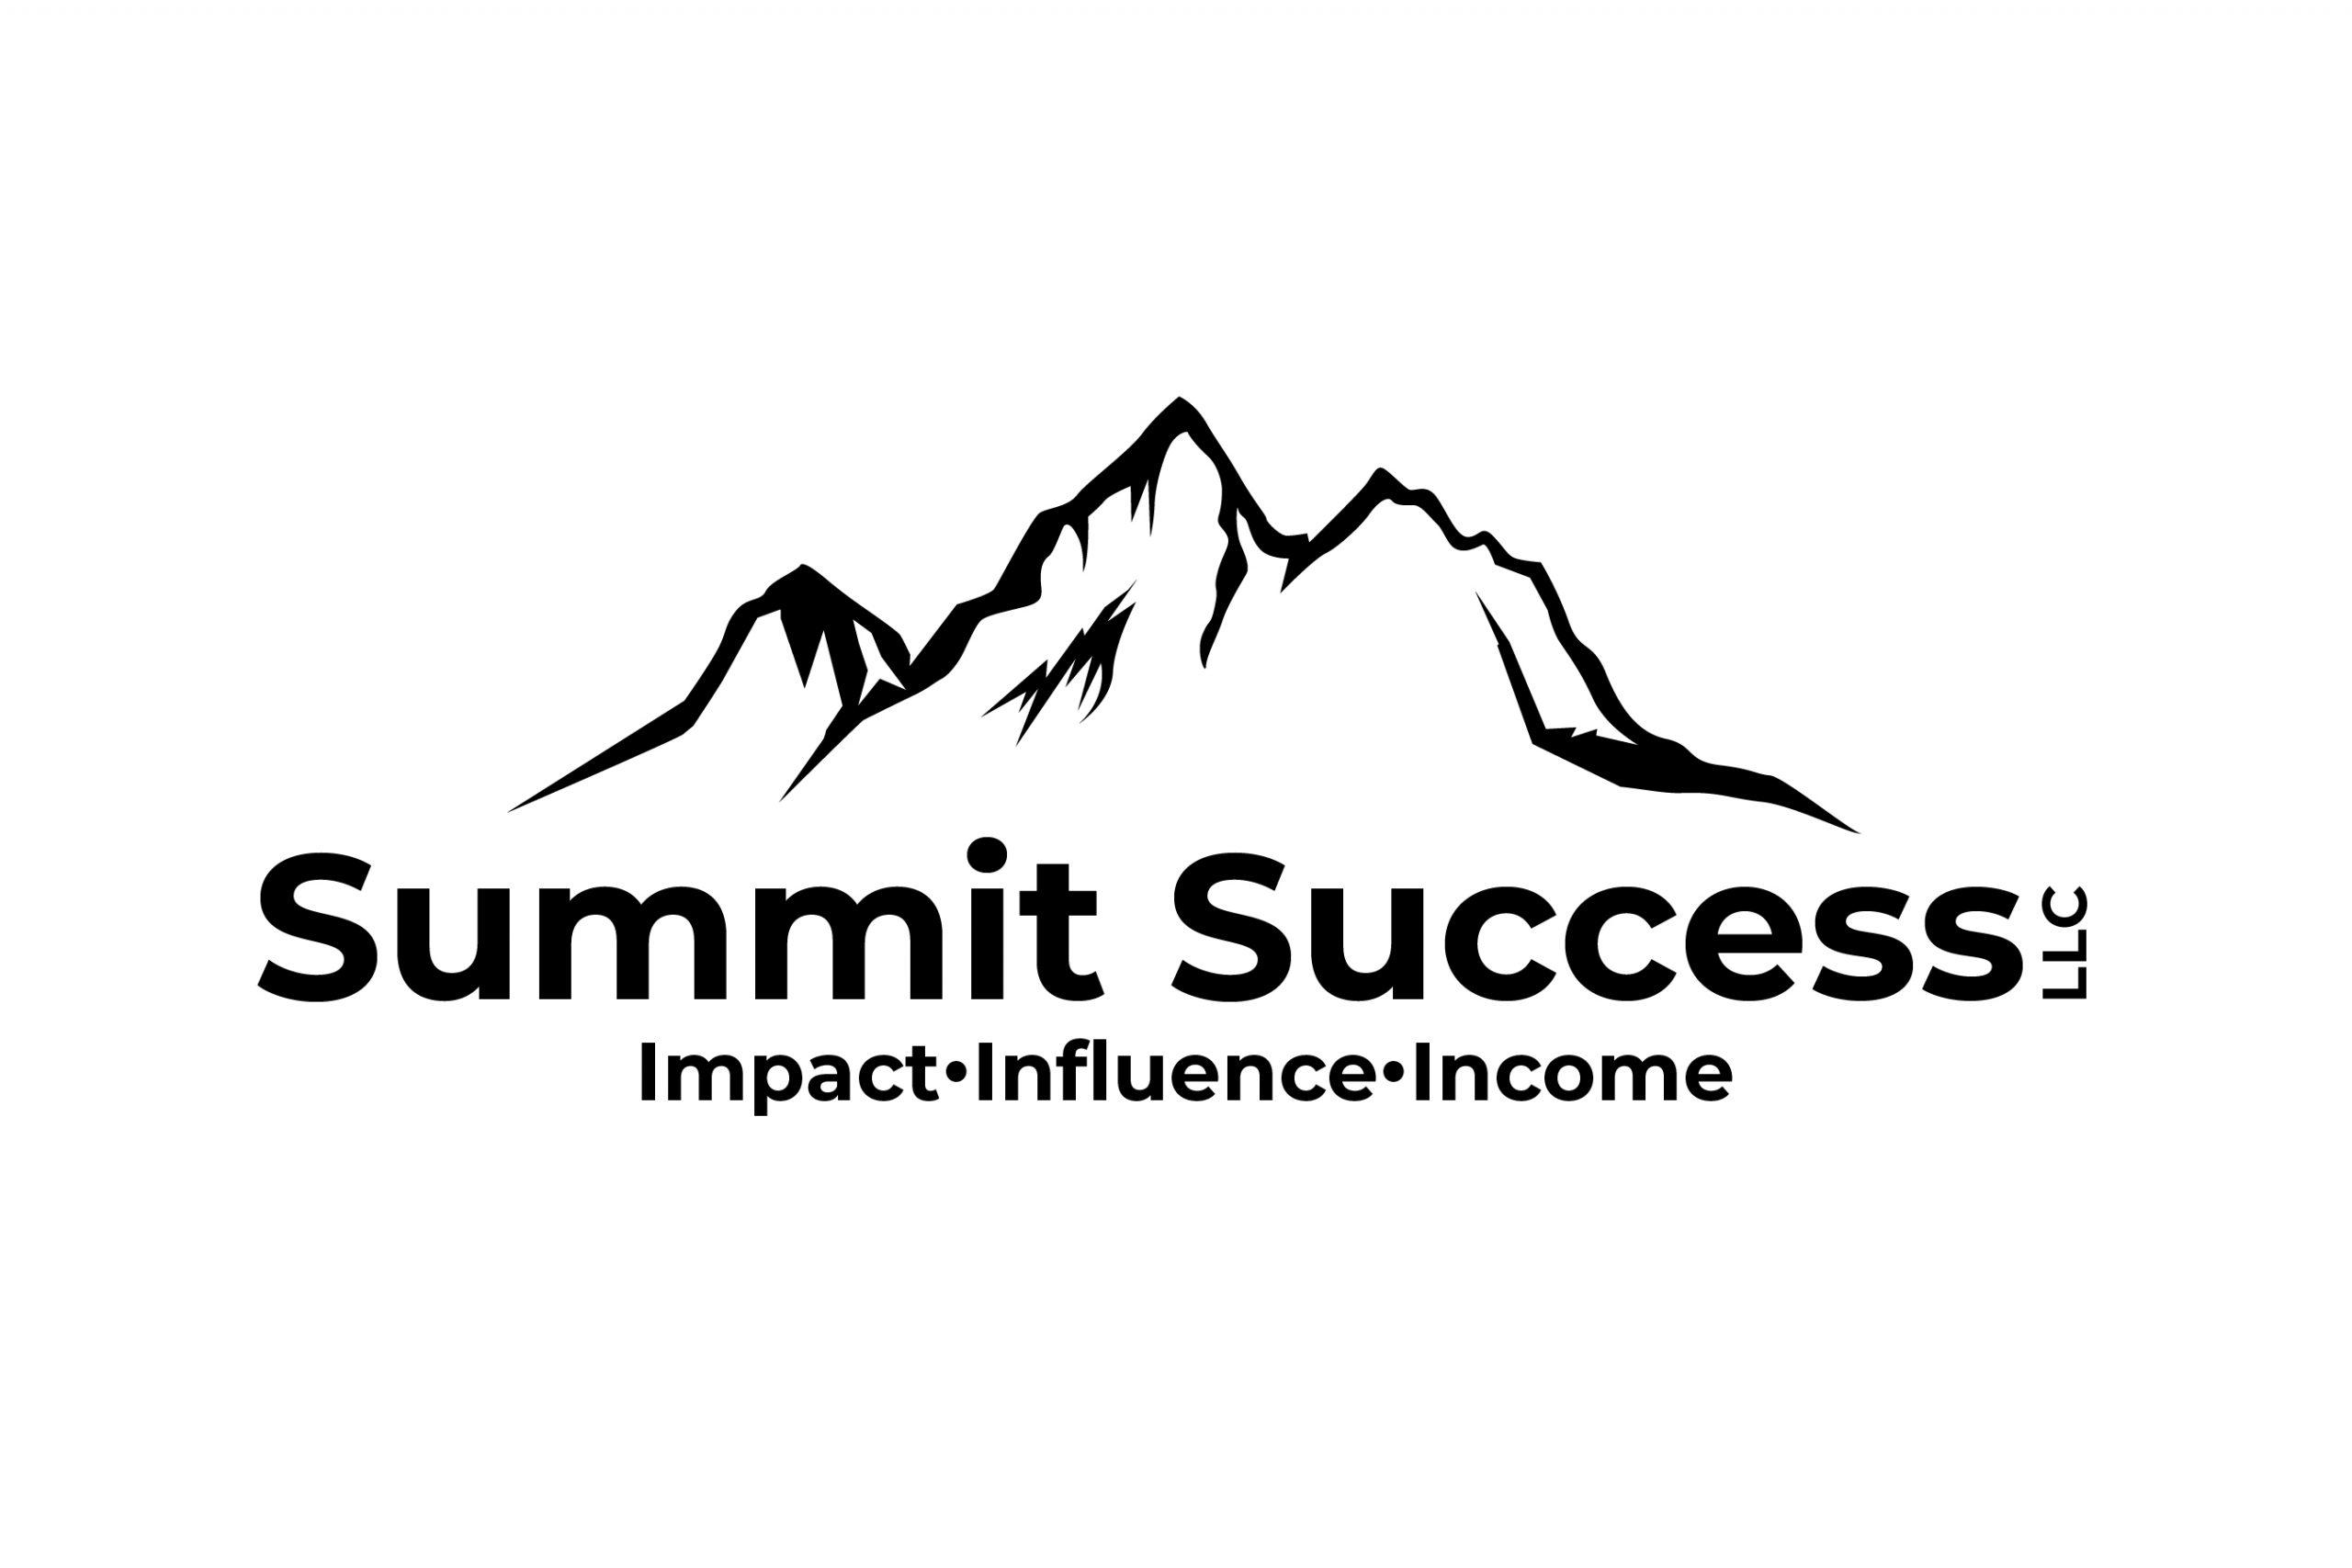 Summit Success